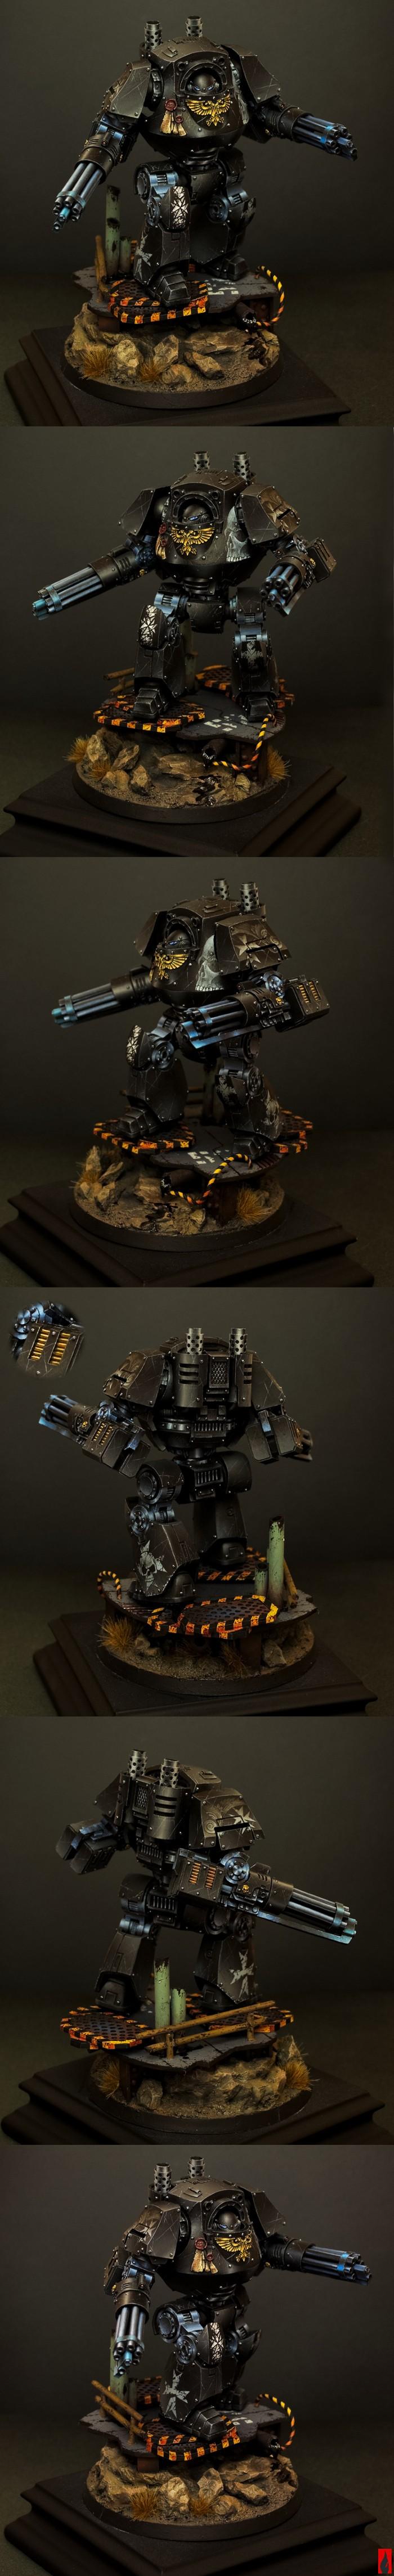 Black Templar venerable dreadnought